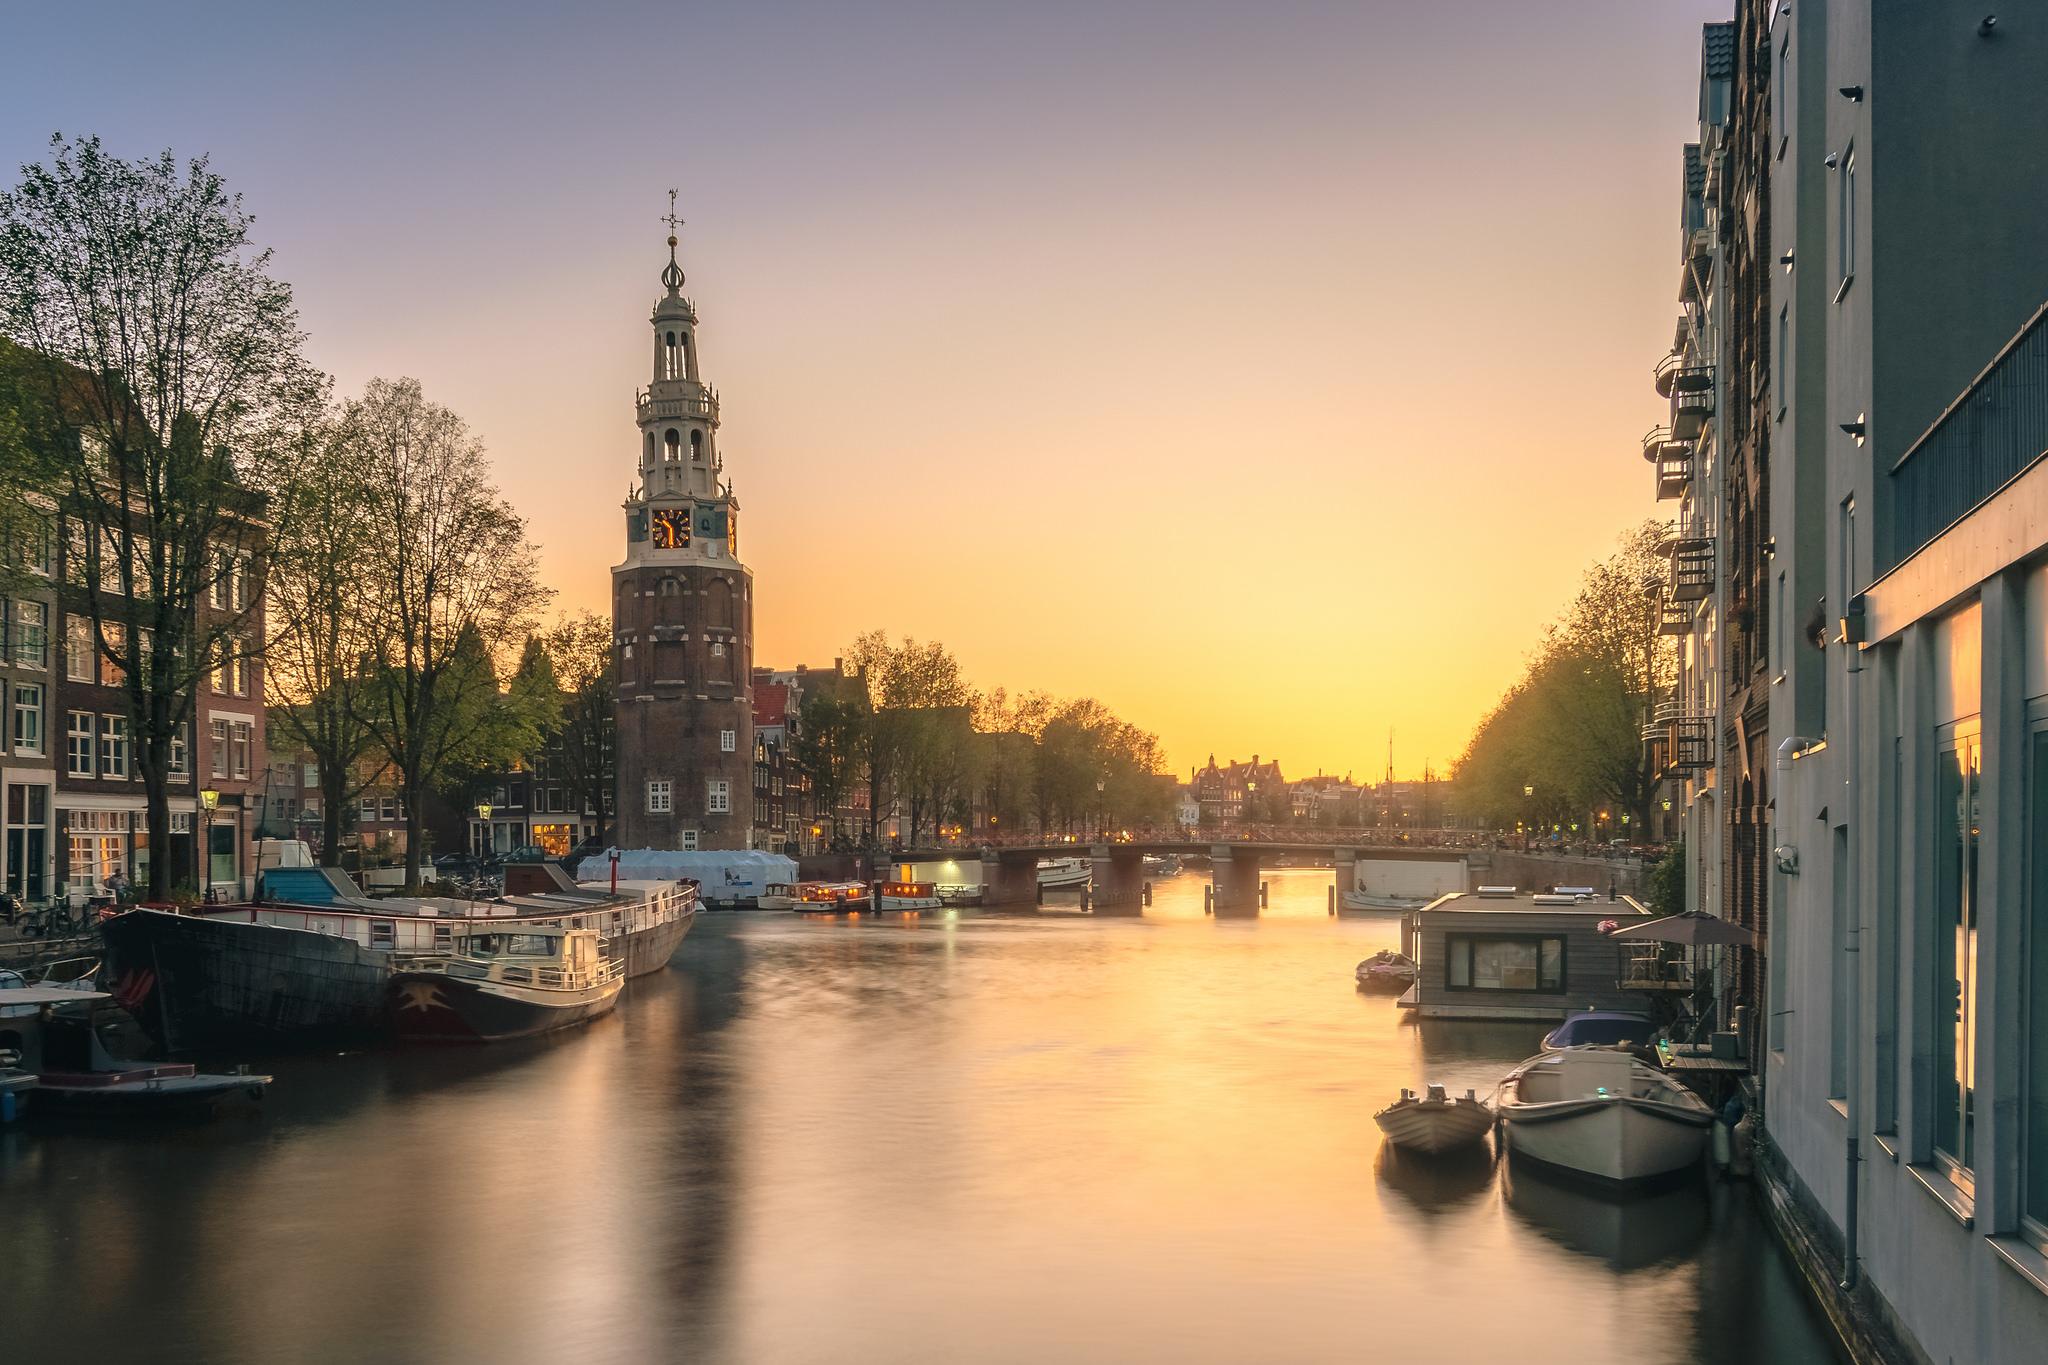 Rapenburgwal, Amsterdam